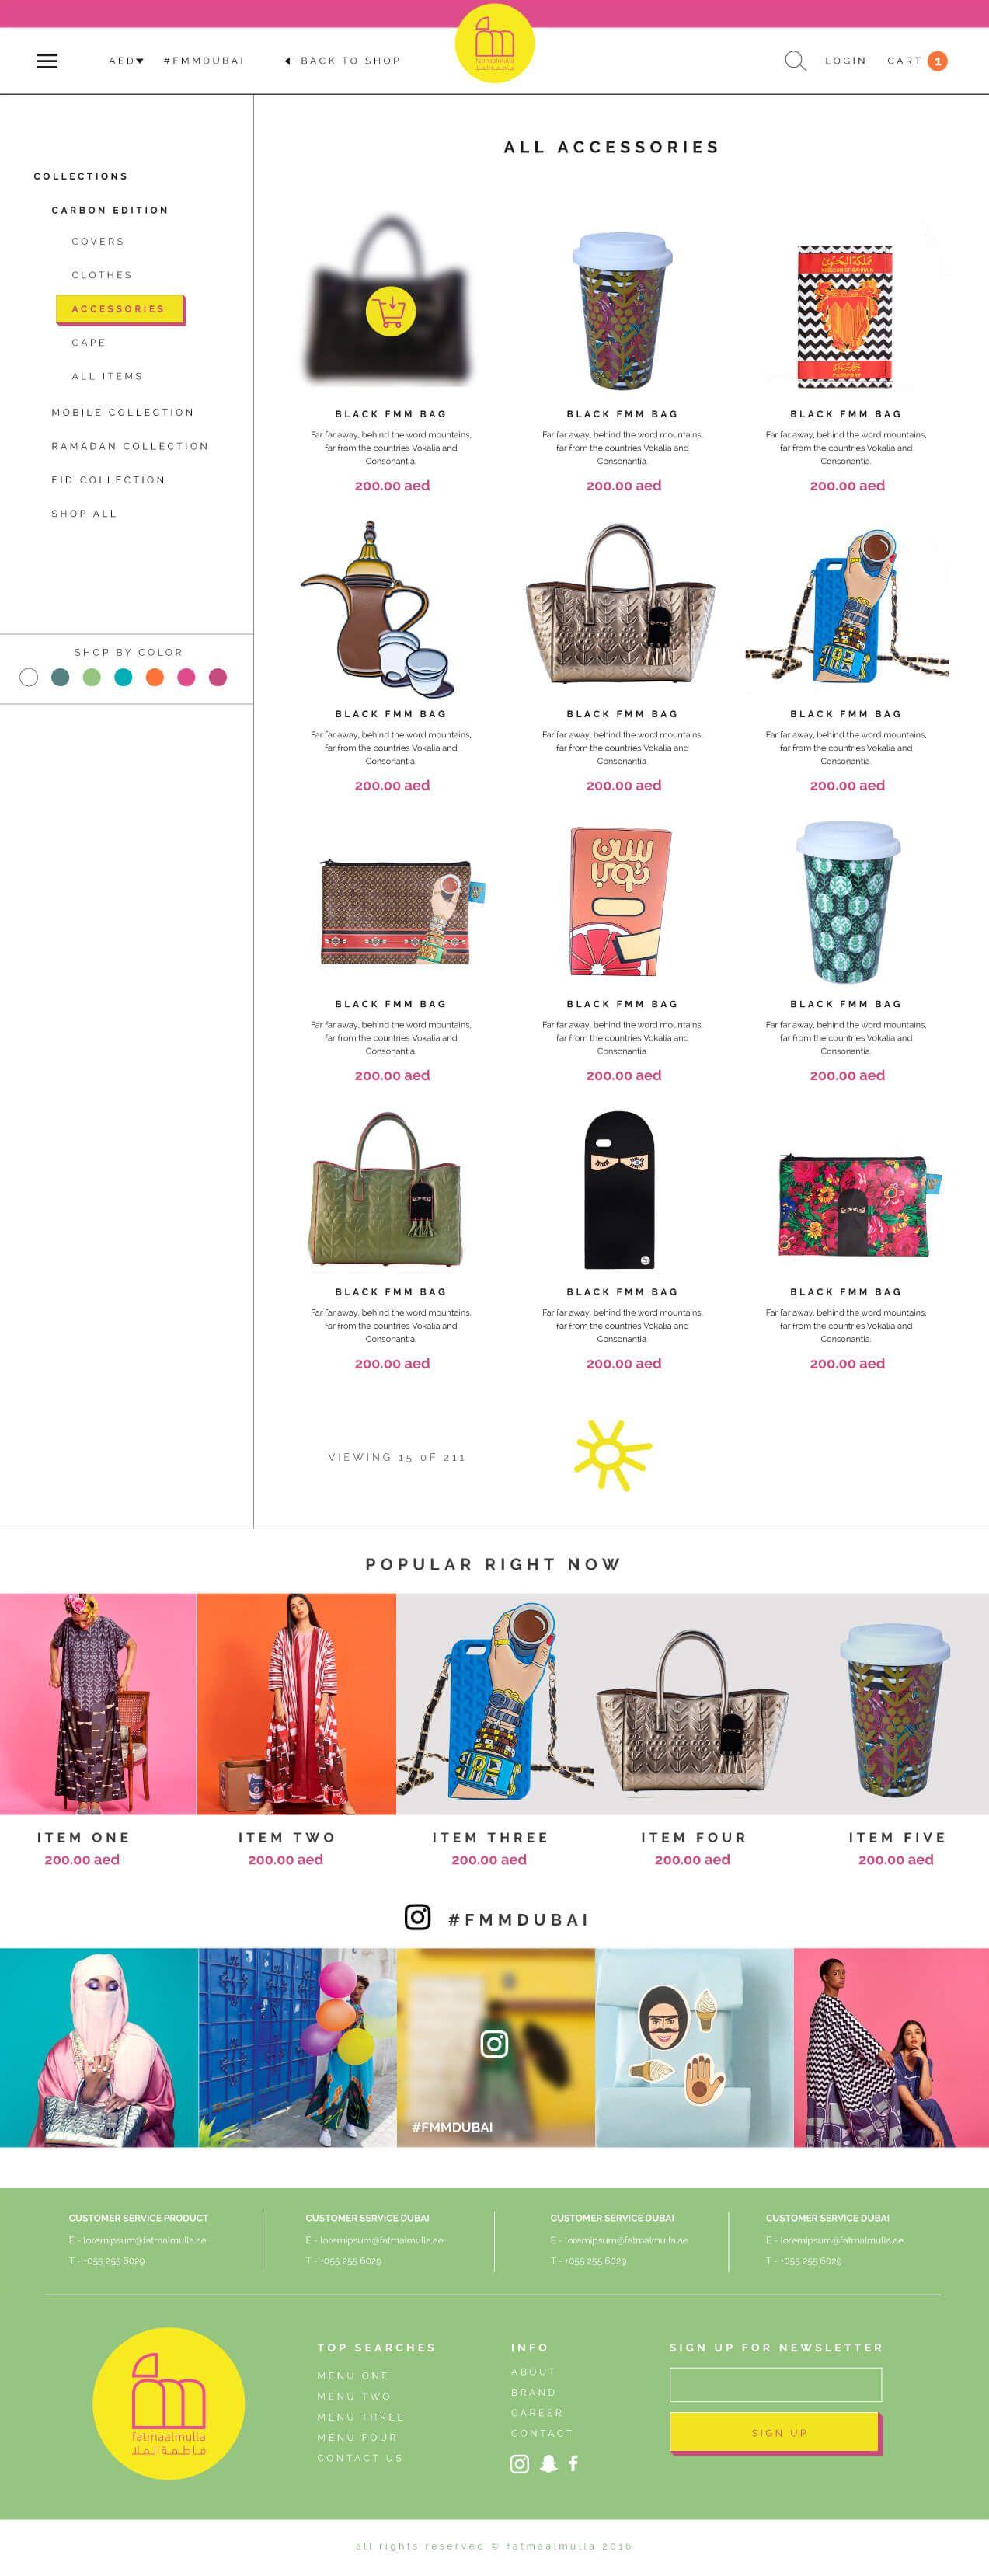 FatmaAlMulla-Webdesign-PDJ-29082016-1455_Product-edit.jpg